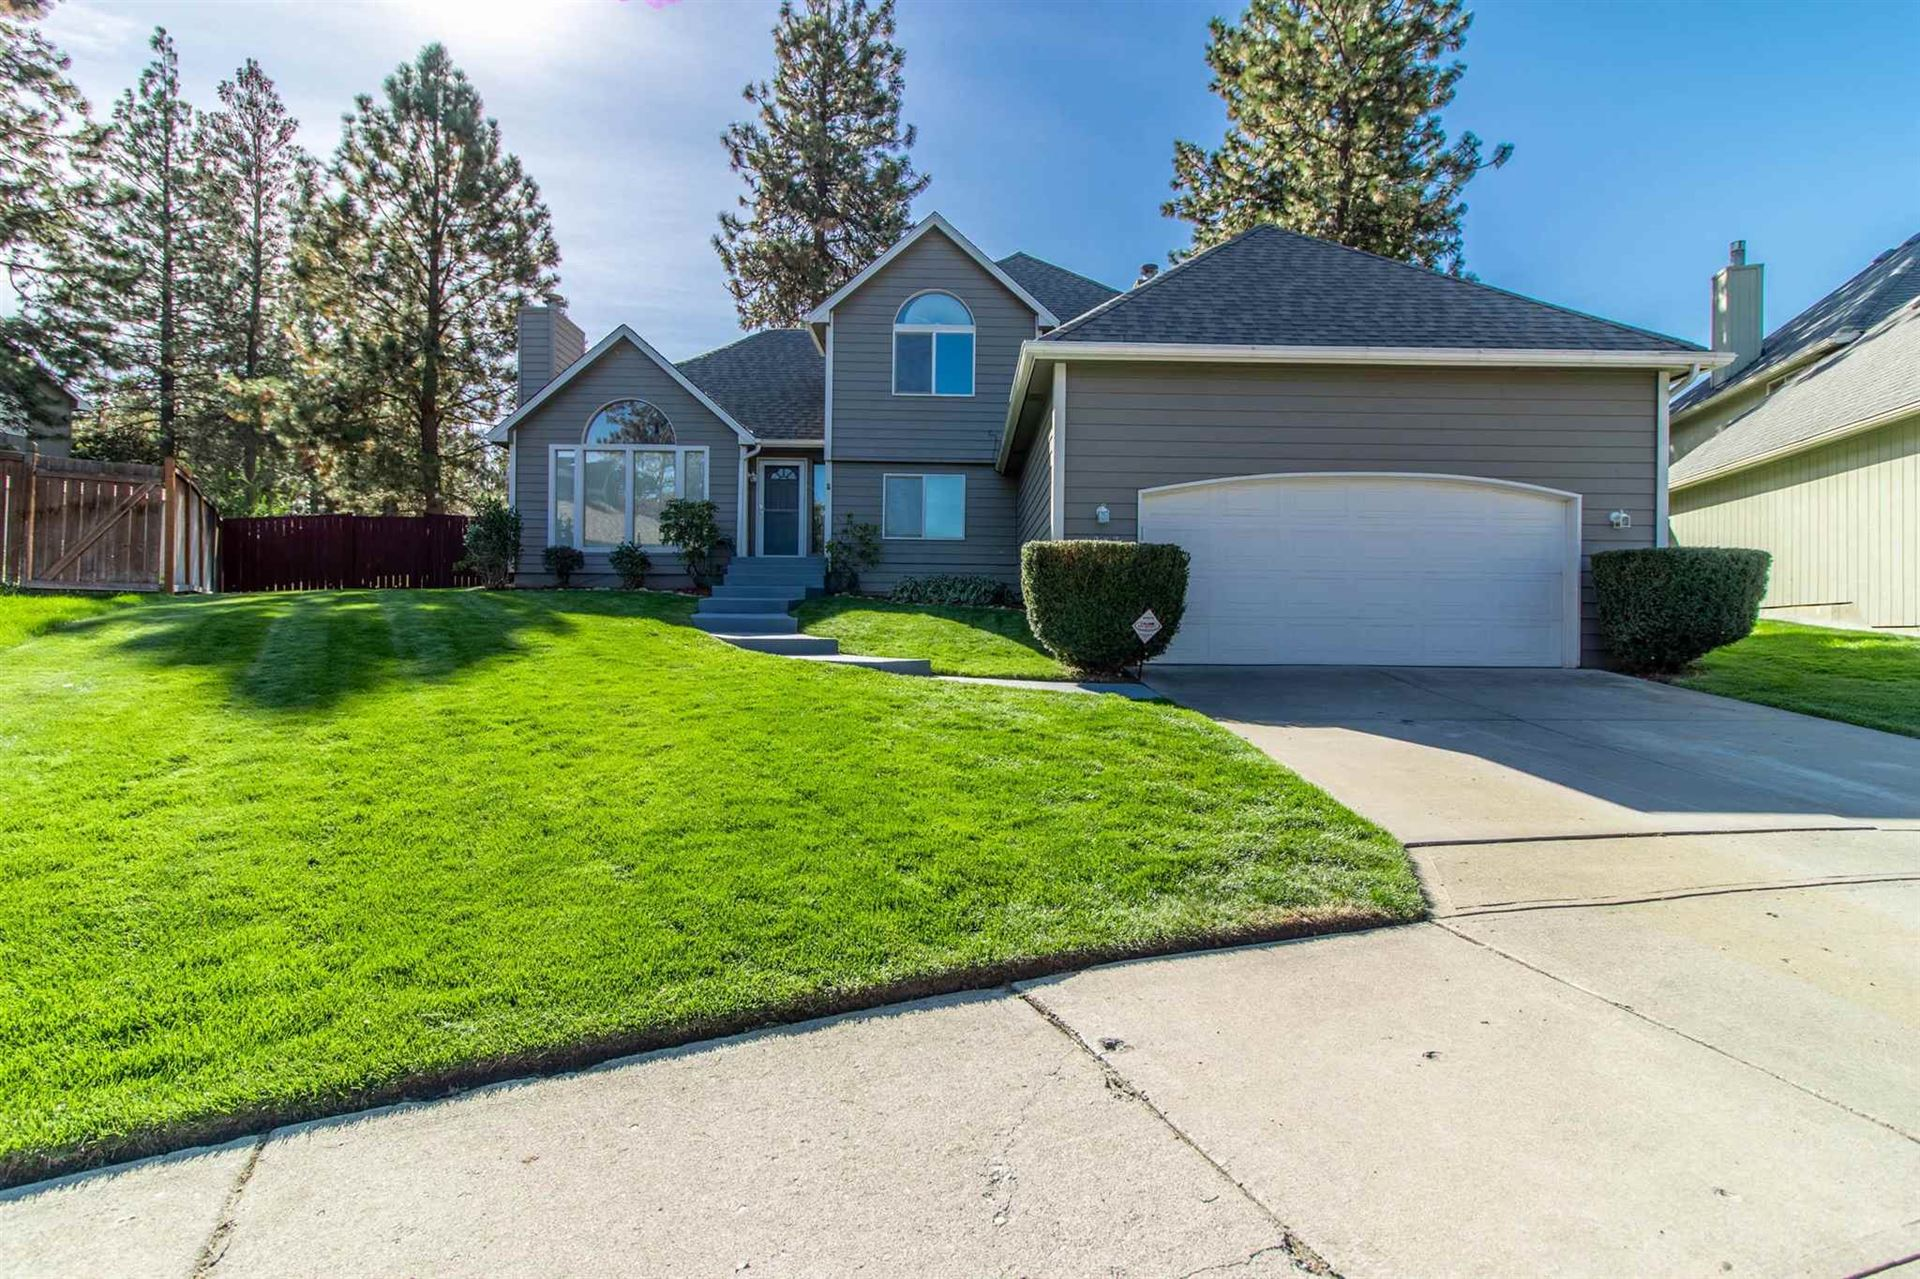 Photo of 4307 S Olympus Ct, Spokane, WA 99223 (MLS # 202122819)